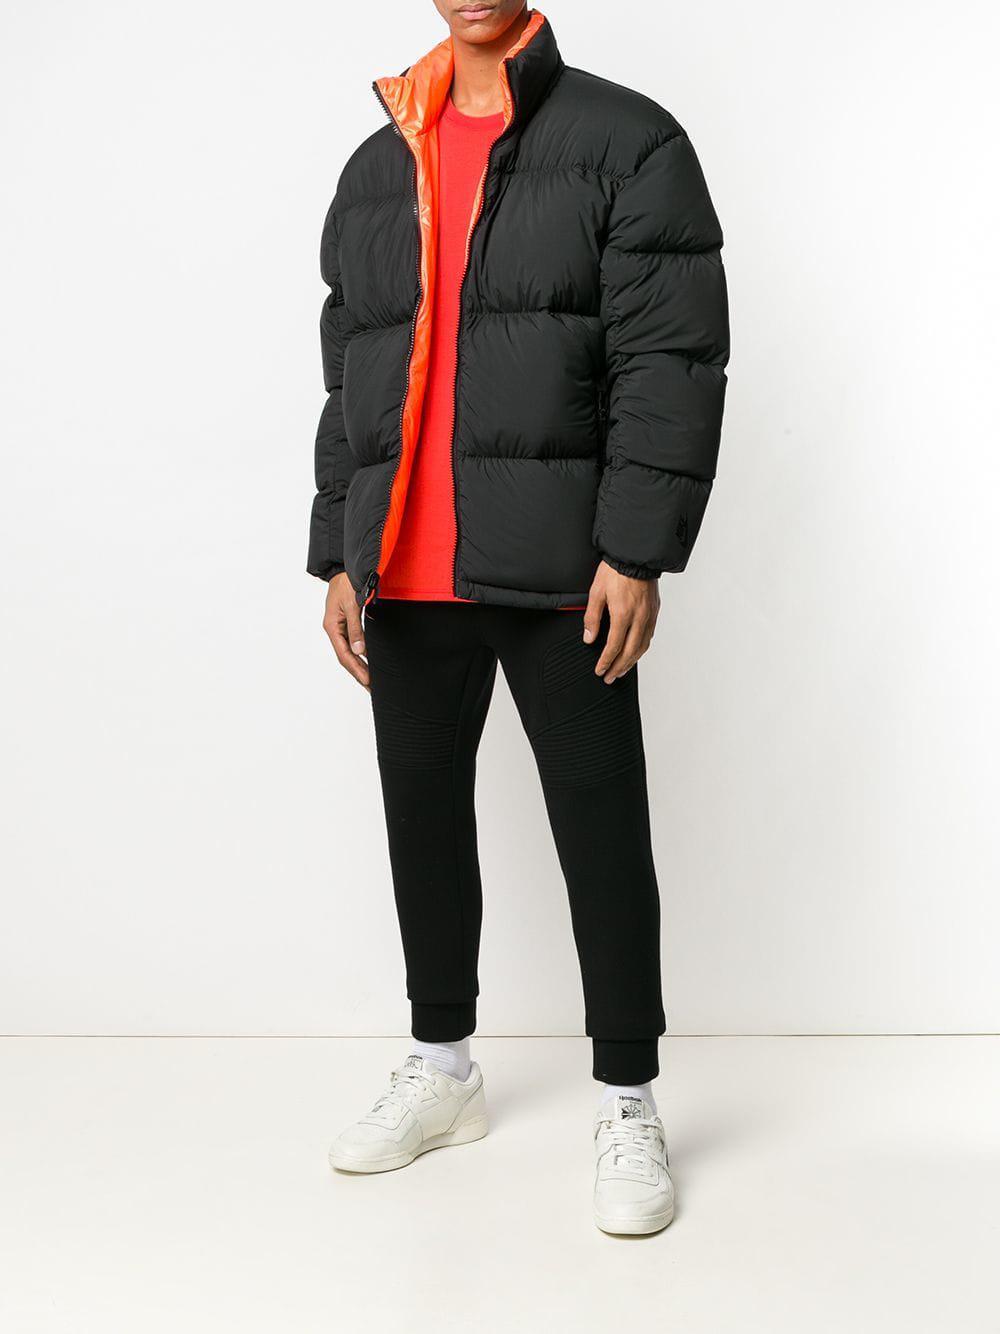 95c7197031eb Lyst - Nike Nrg Padded Jacket in Black for Men